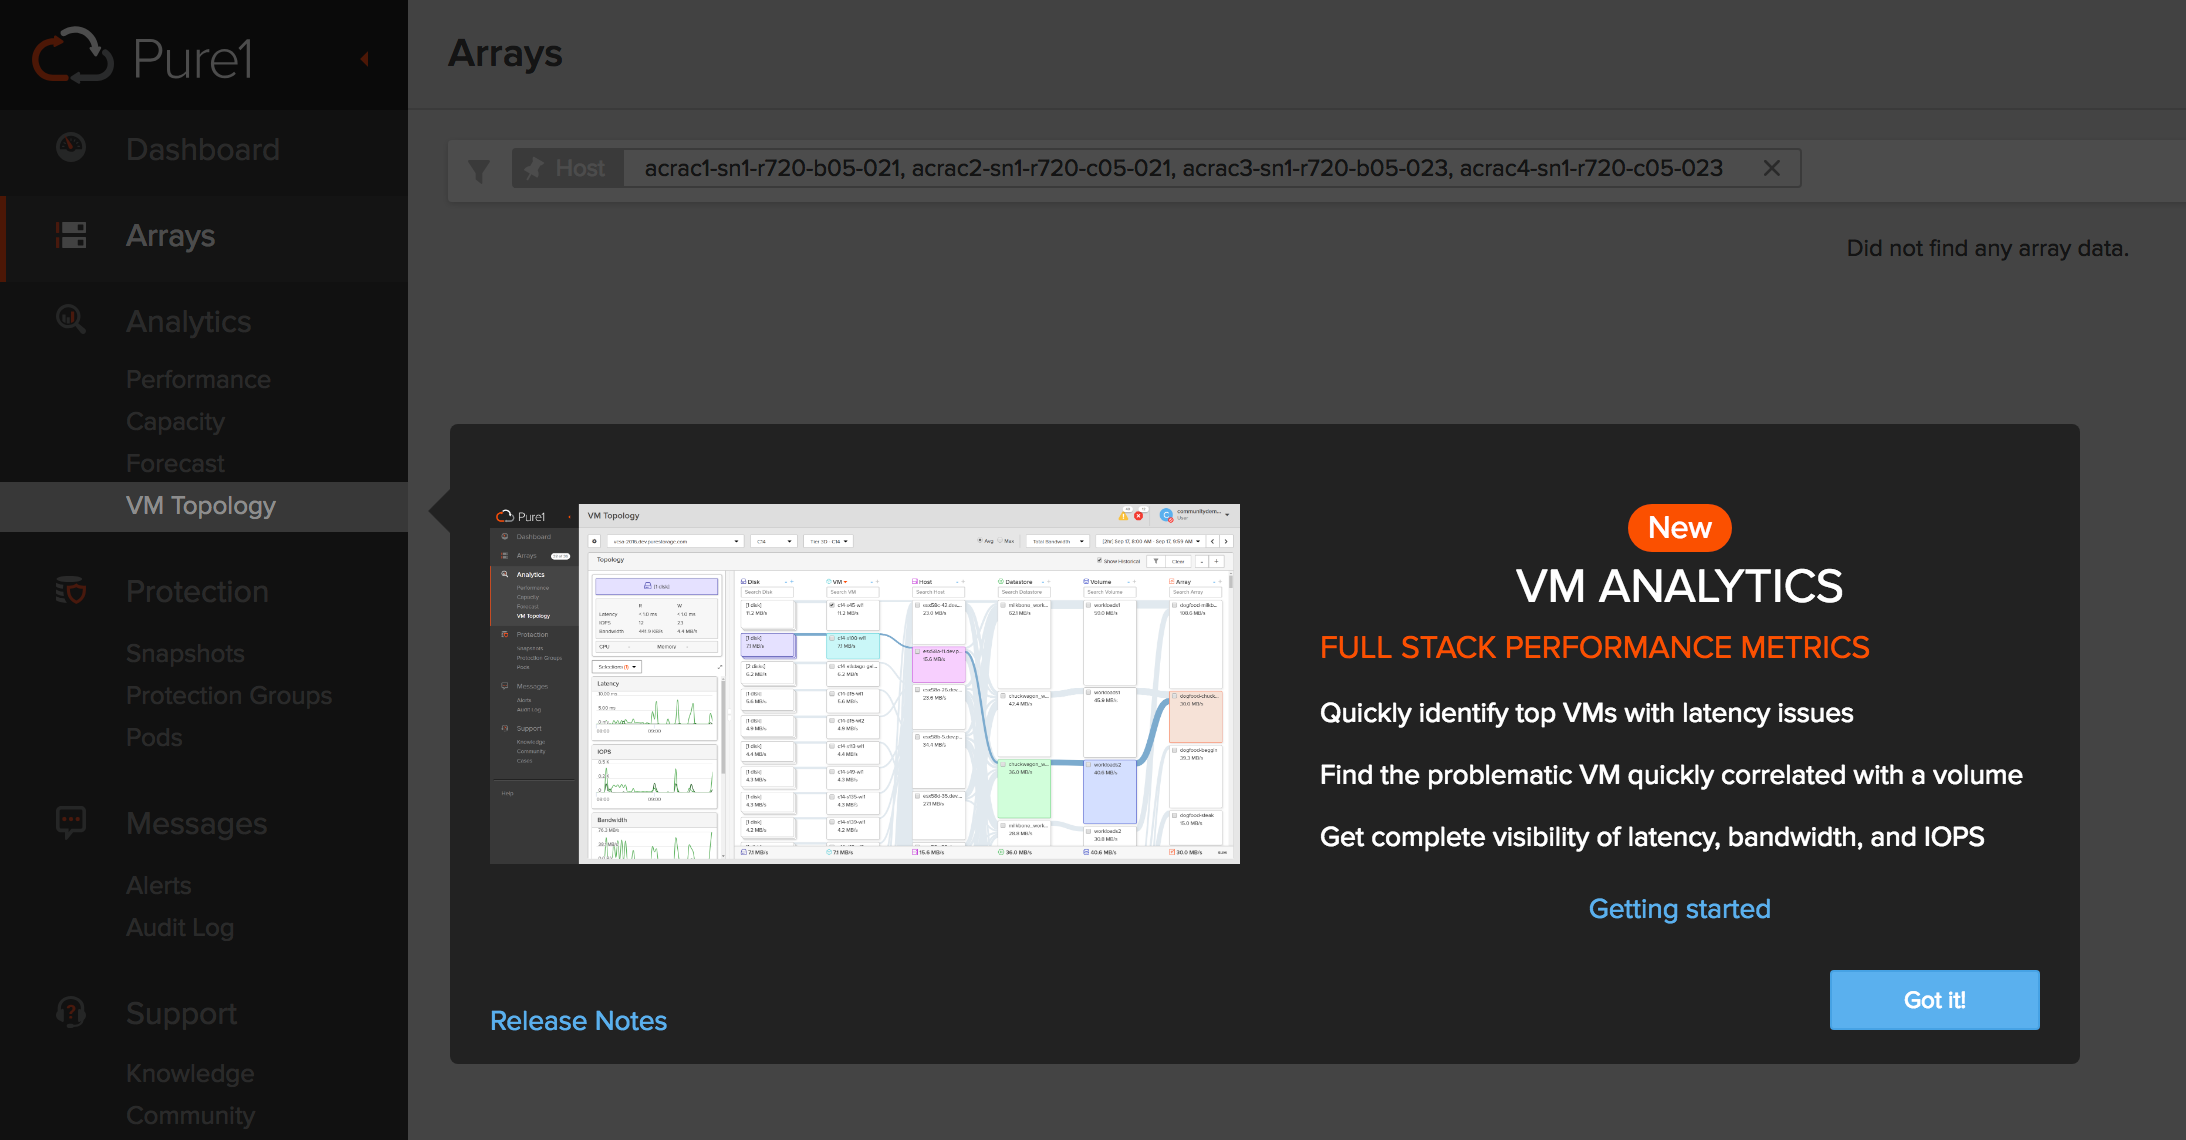 Configuring Pure1 VM Analytics | Cody Hosterman